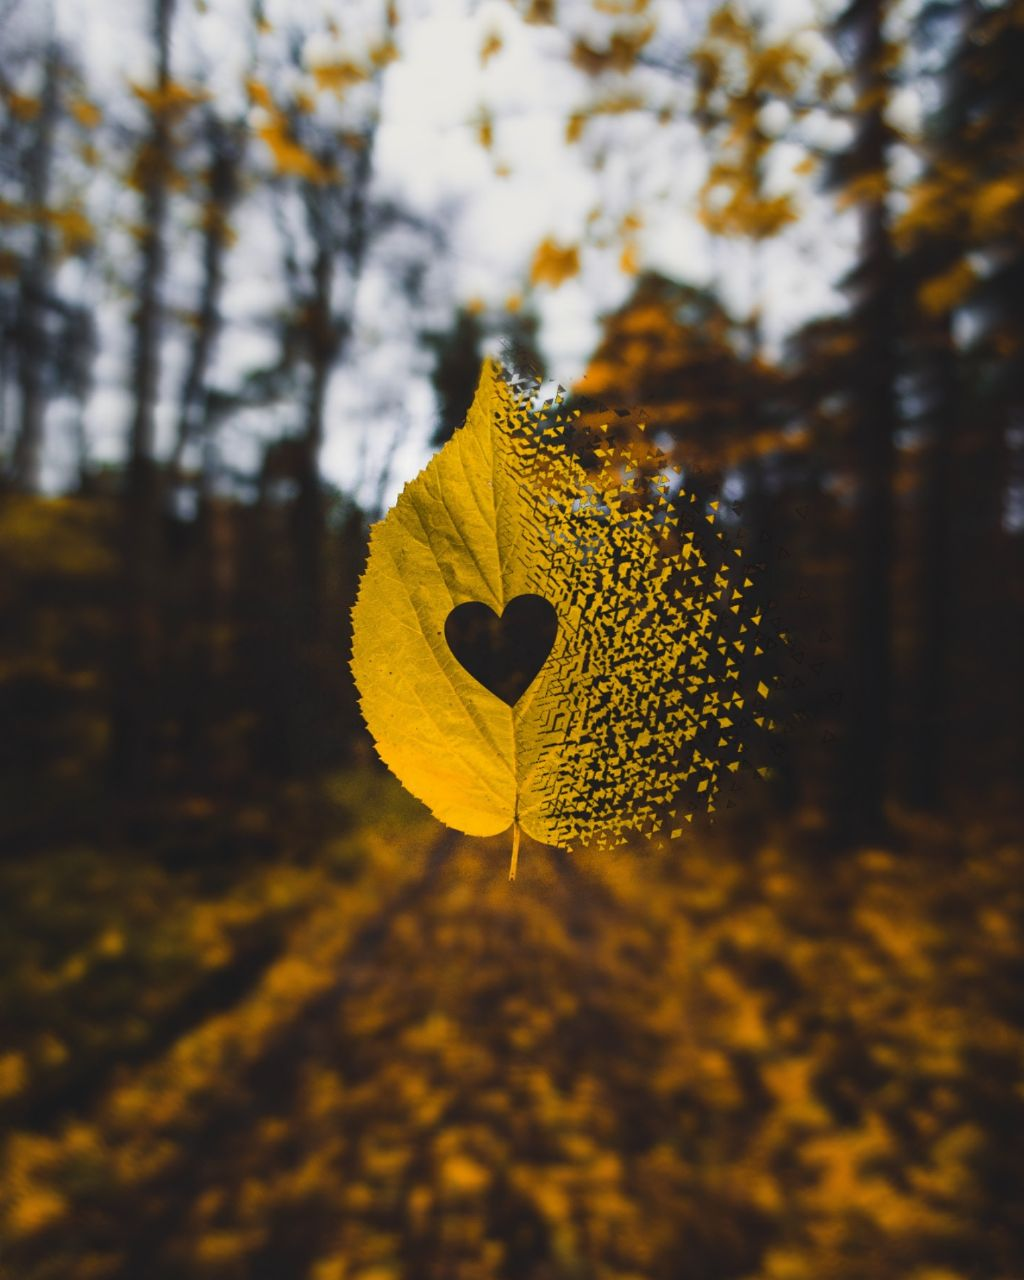 #freetoedit #fall #autumn #leaf